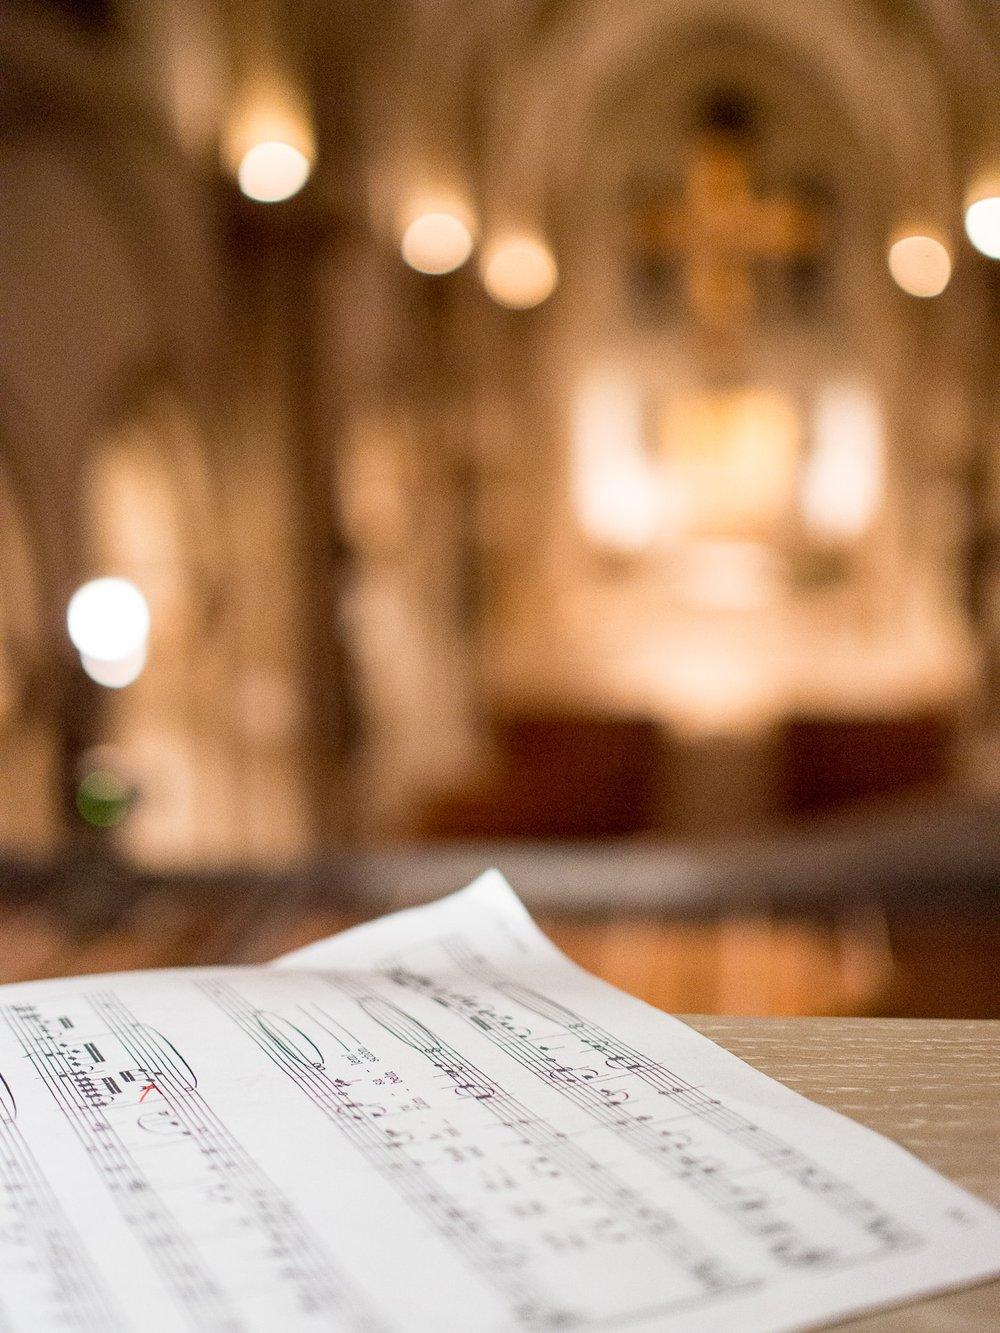 12.10.21.07.29 - Instawalk Dom Osnabrück.jpg